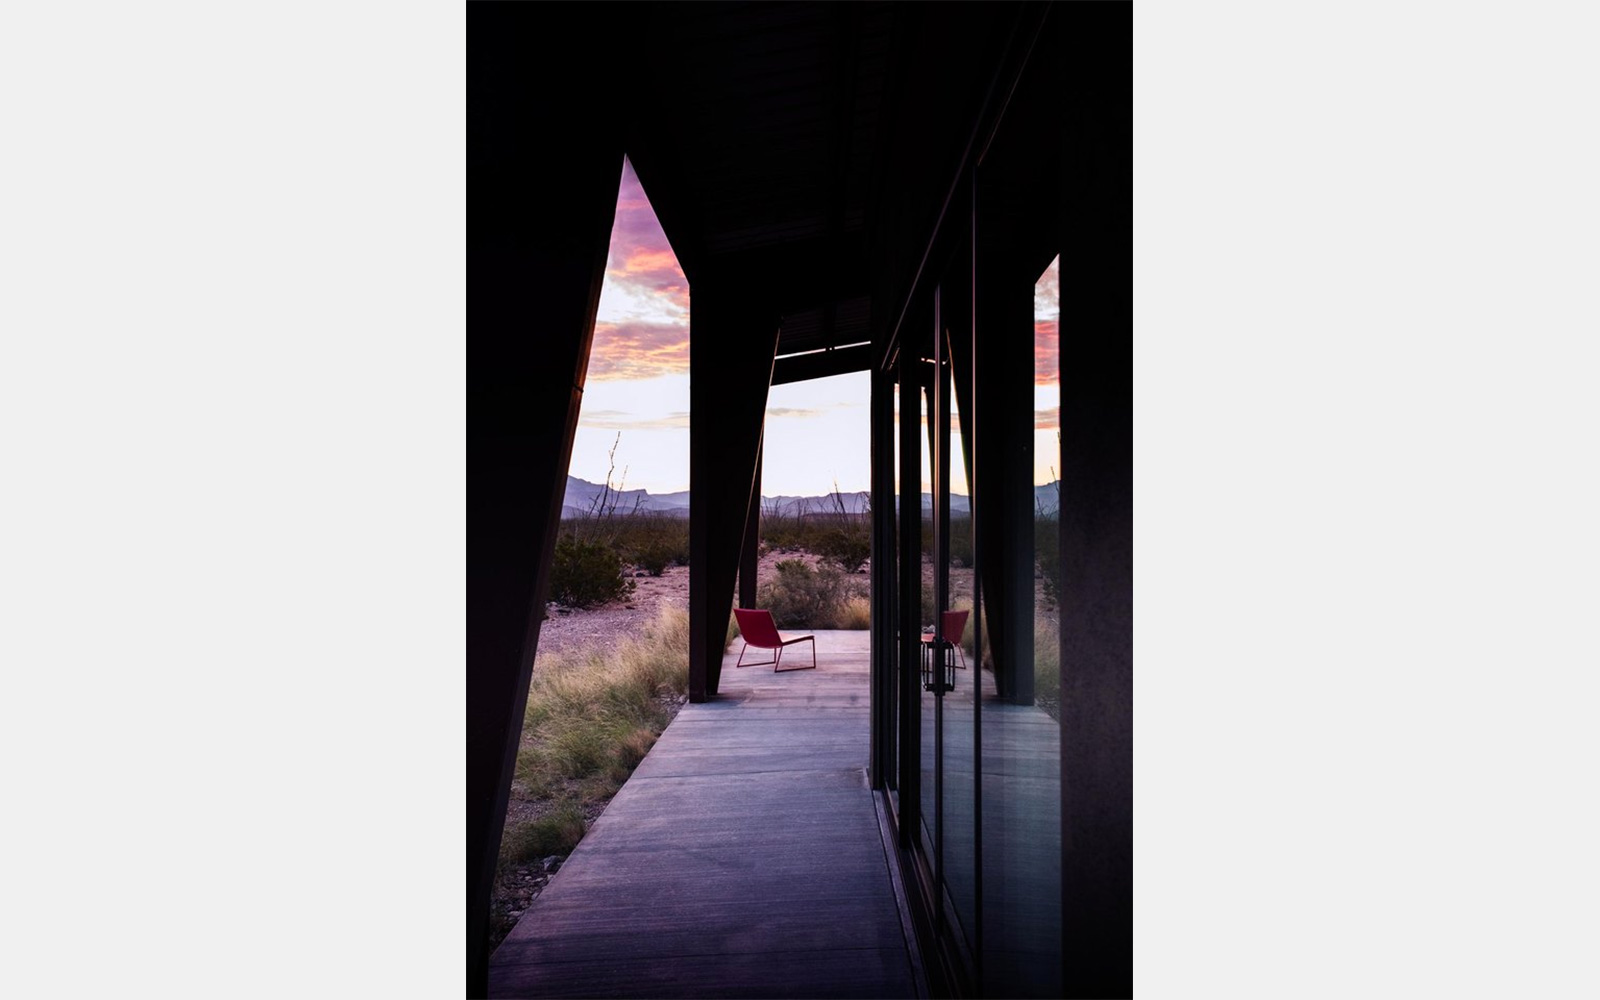 Solar holiday home to rent near Marfa, Texas